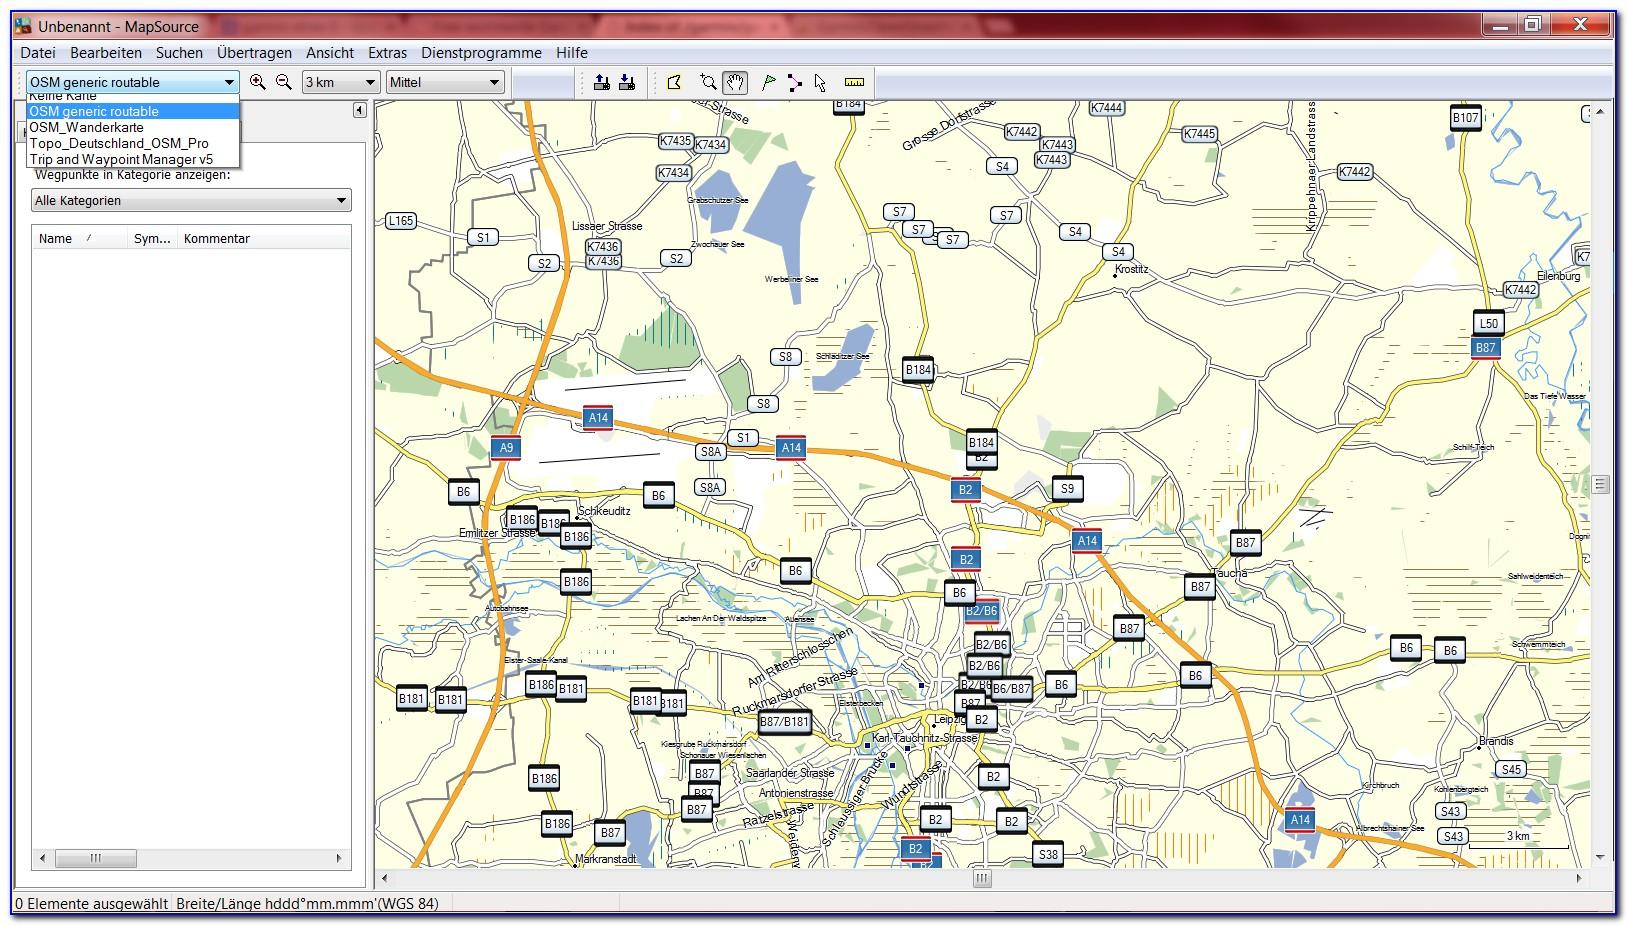 Garmin Gps Maps 64s